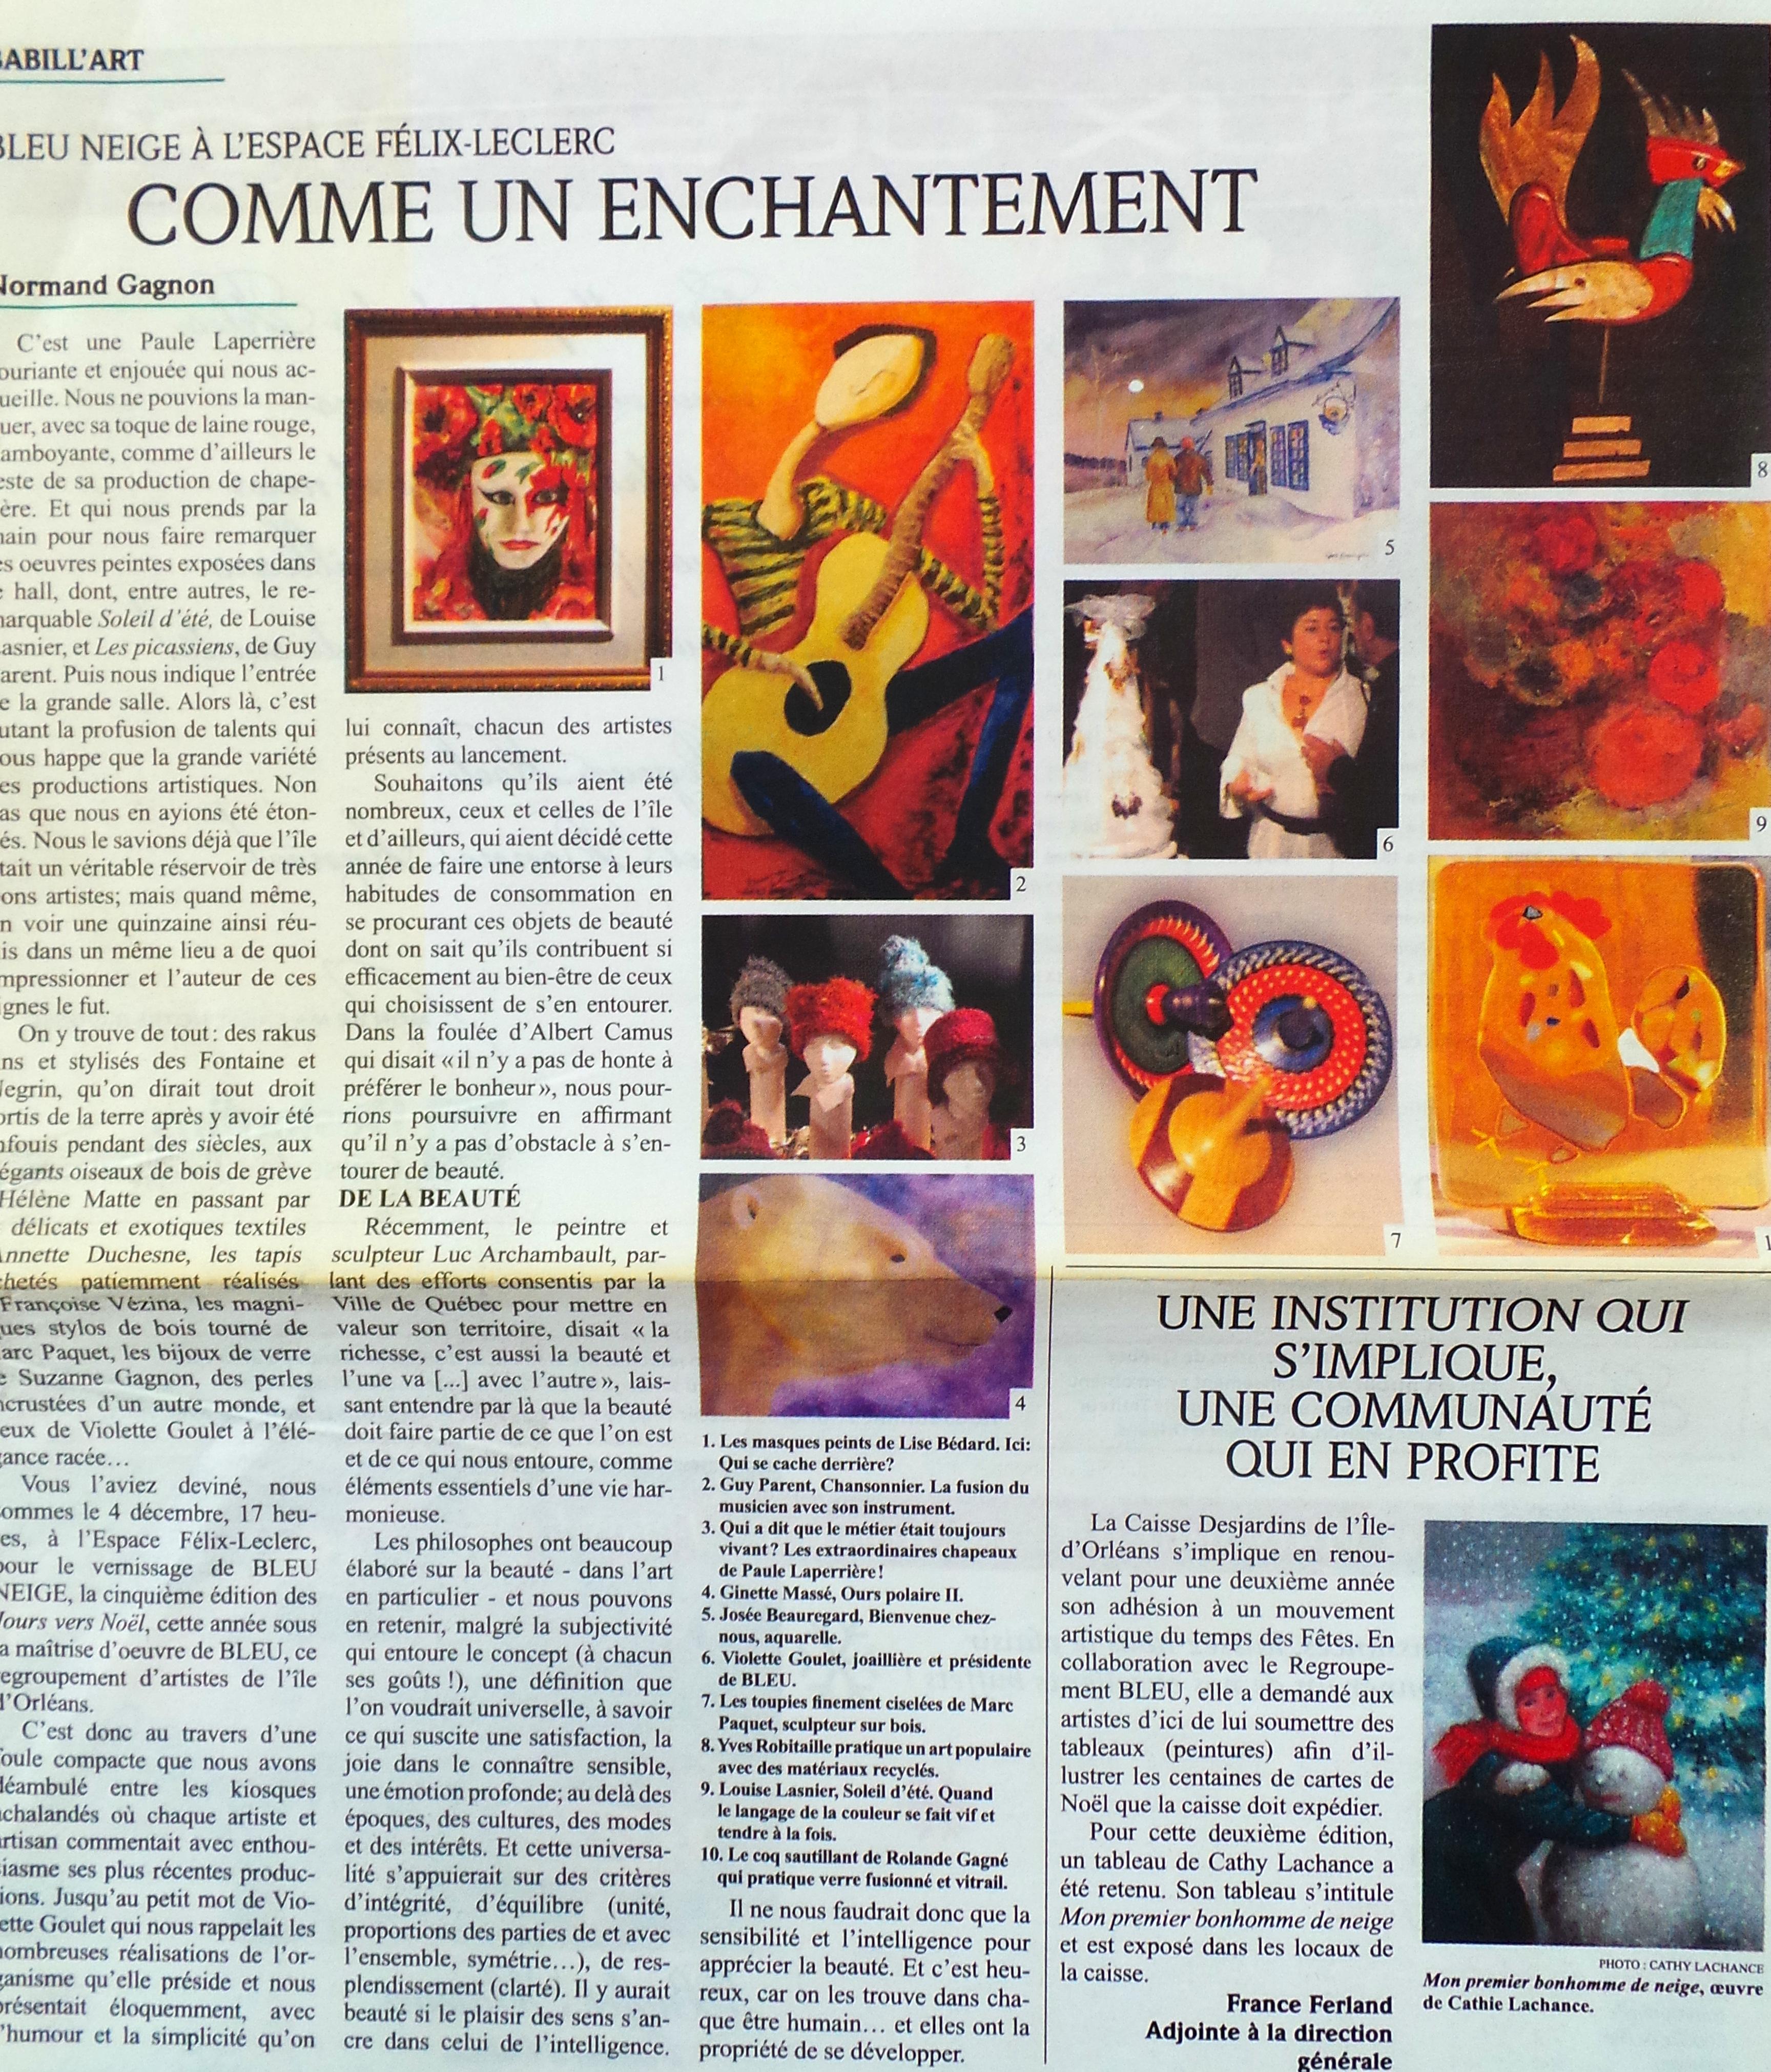 2009 Bleu Neige reportage